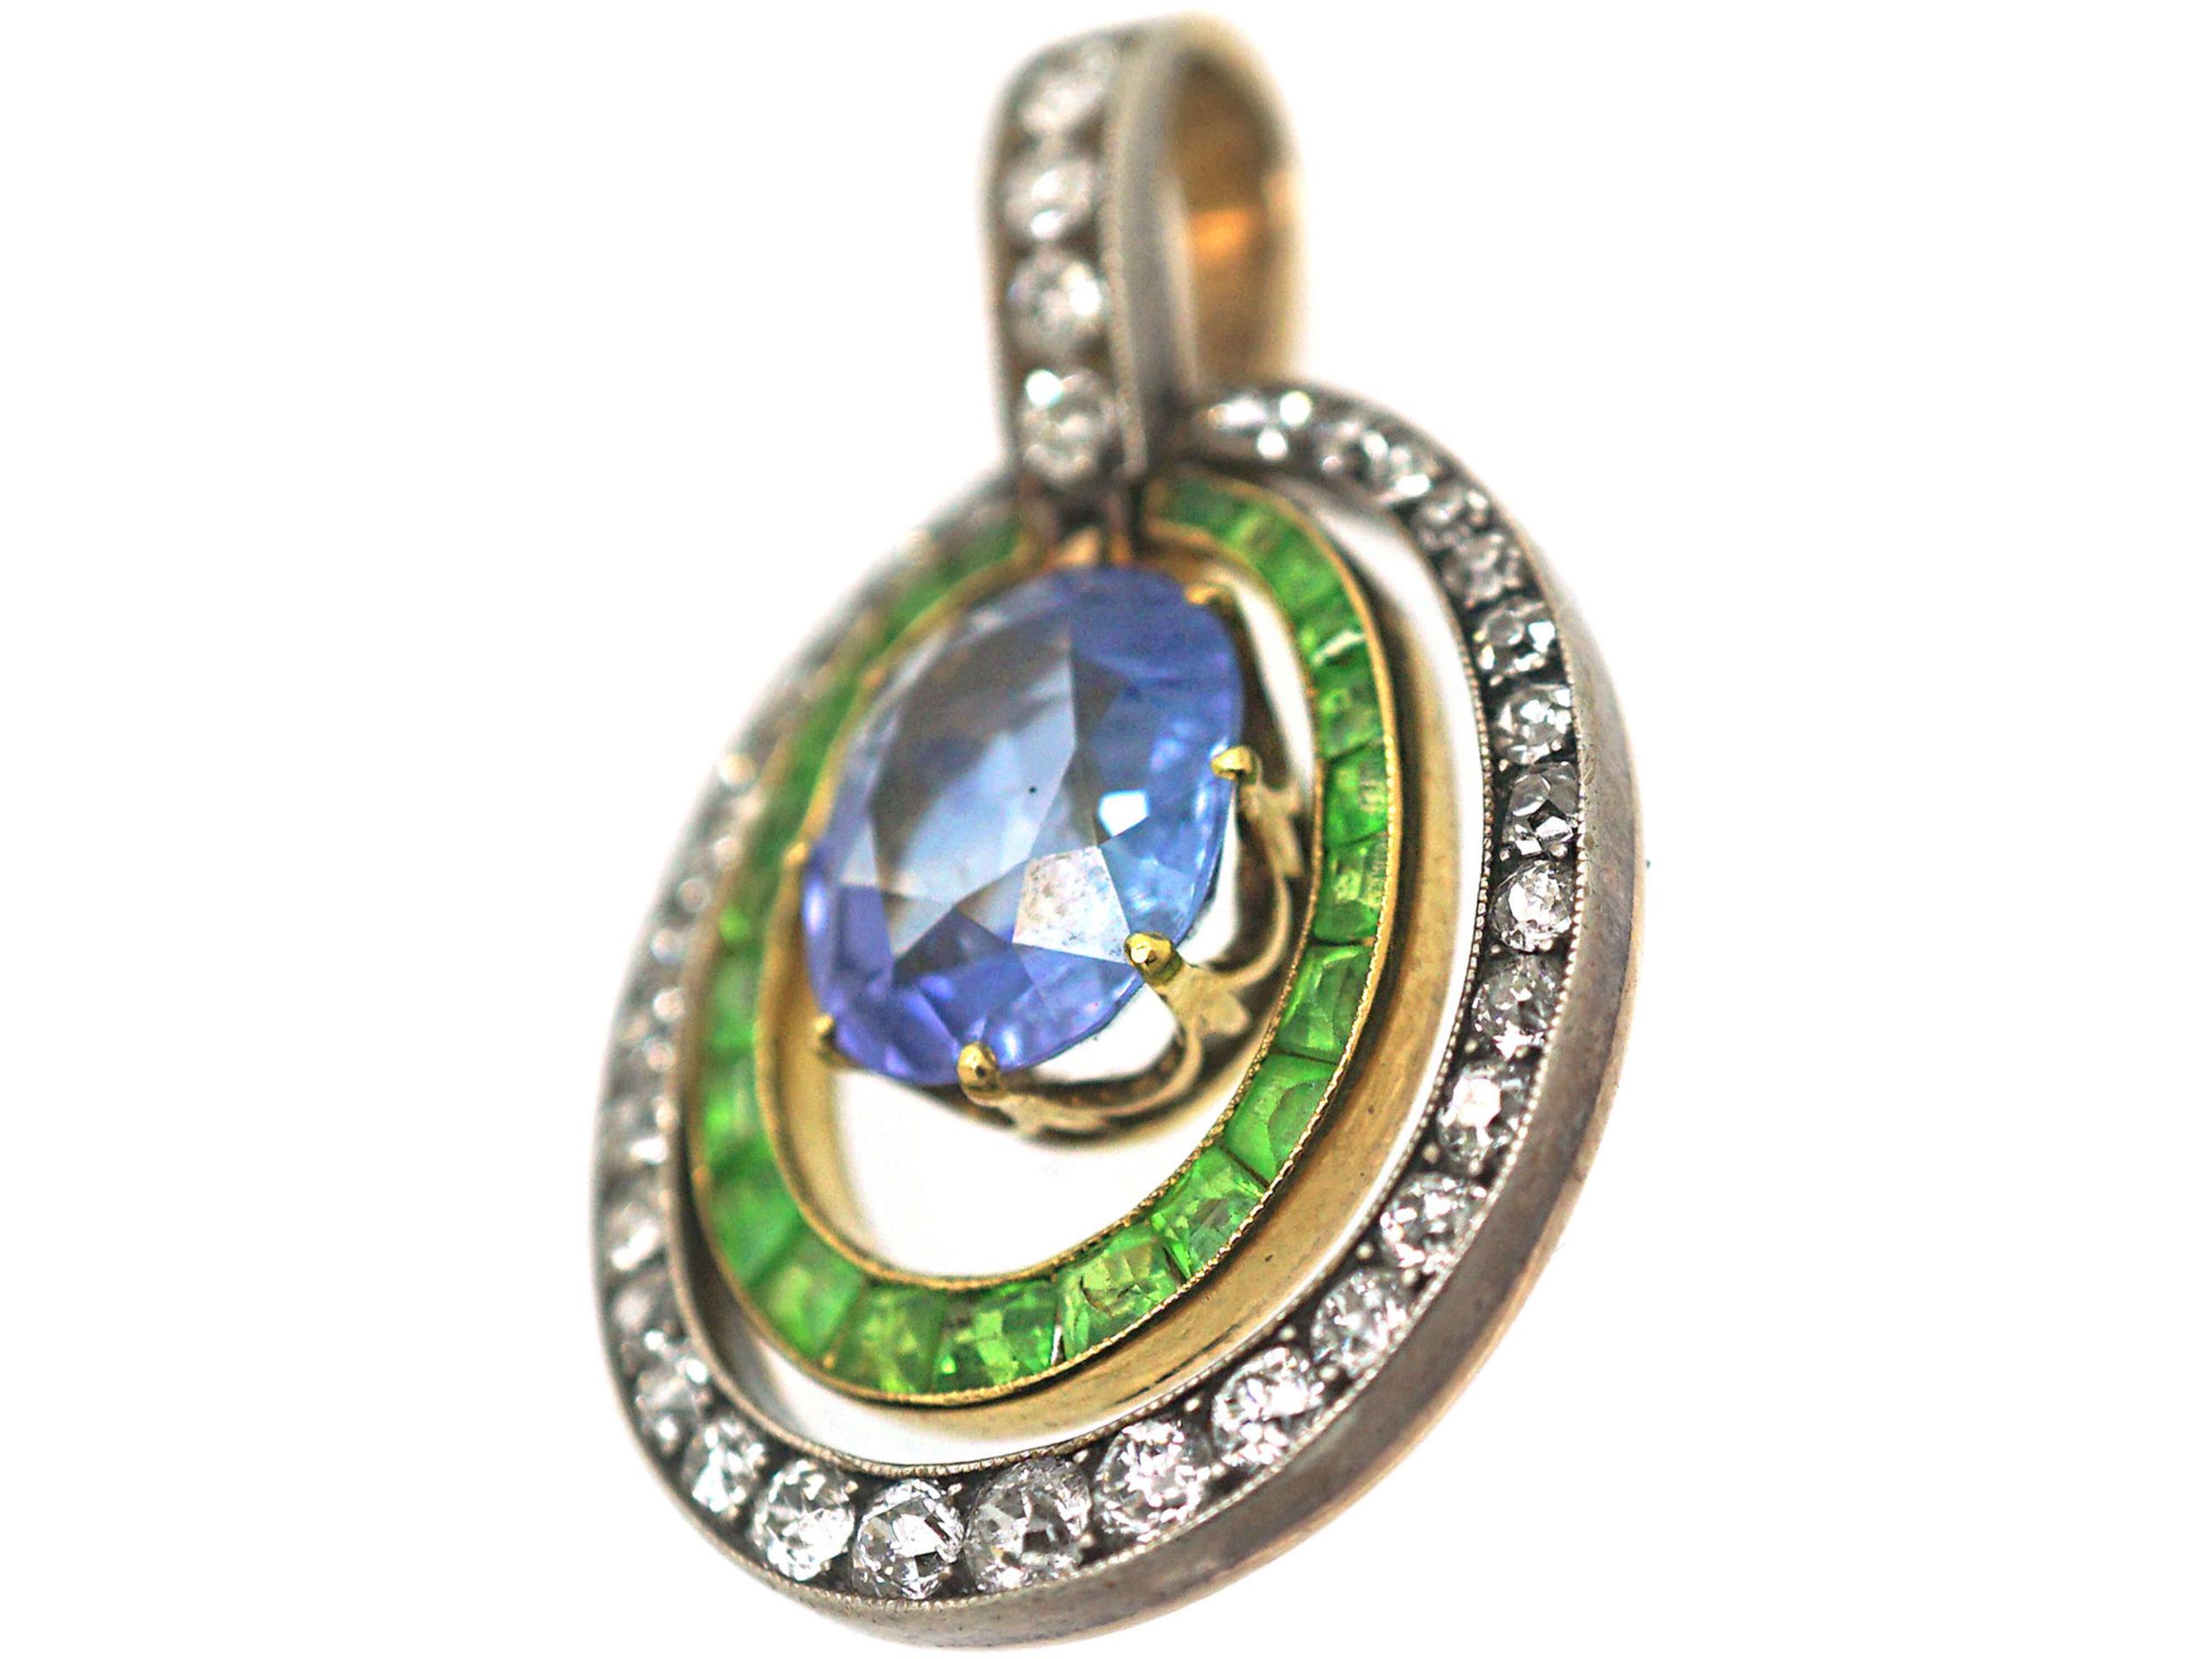 French Belle Epoque 18ct Gold, Sapphire, Demantoid Garnet & Diamond Pendant